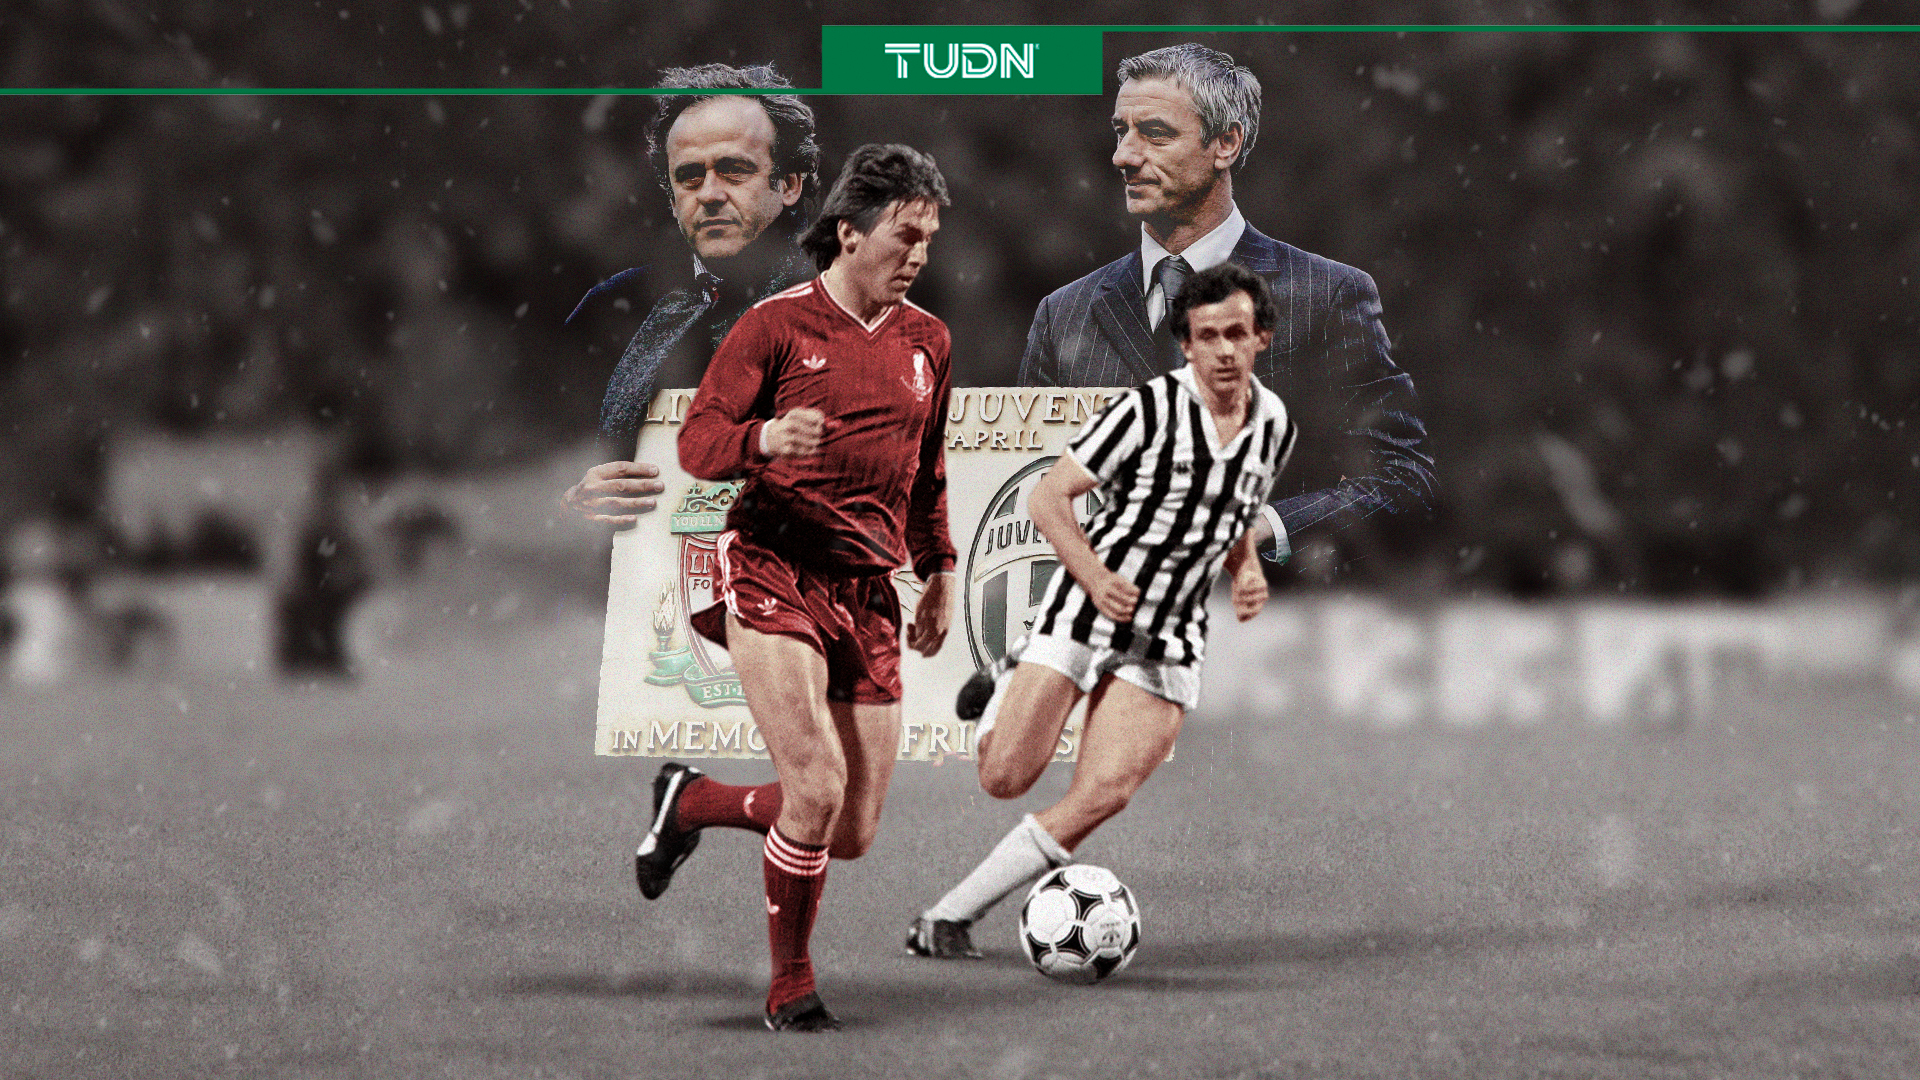 La Imborrable Mancha De Sangre En La Copa De Europa De 1985 Deportes Uefa Champions League Tudn Univision